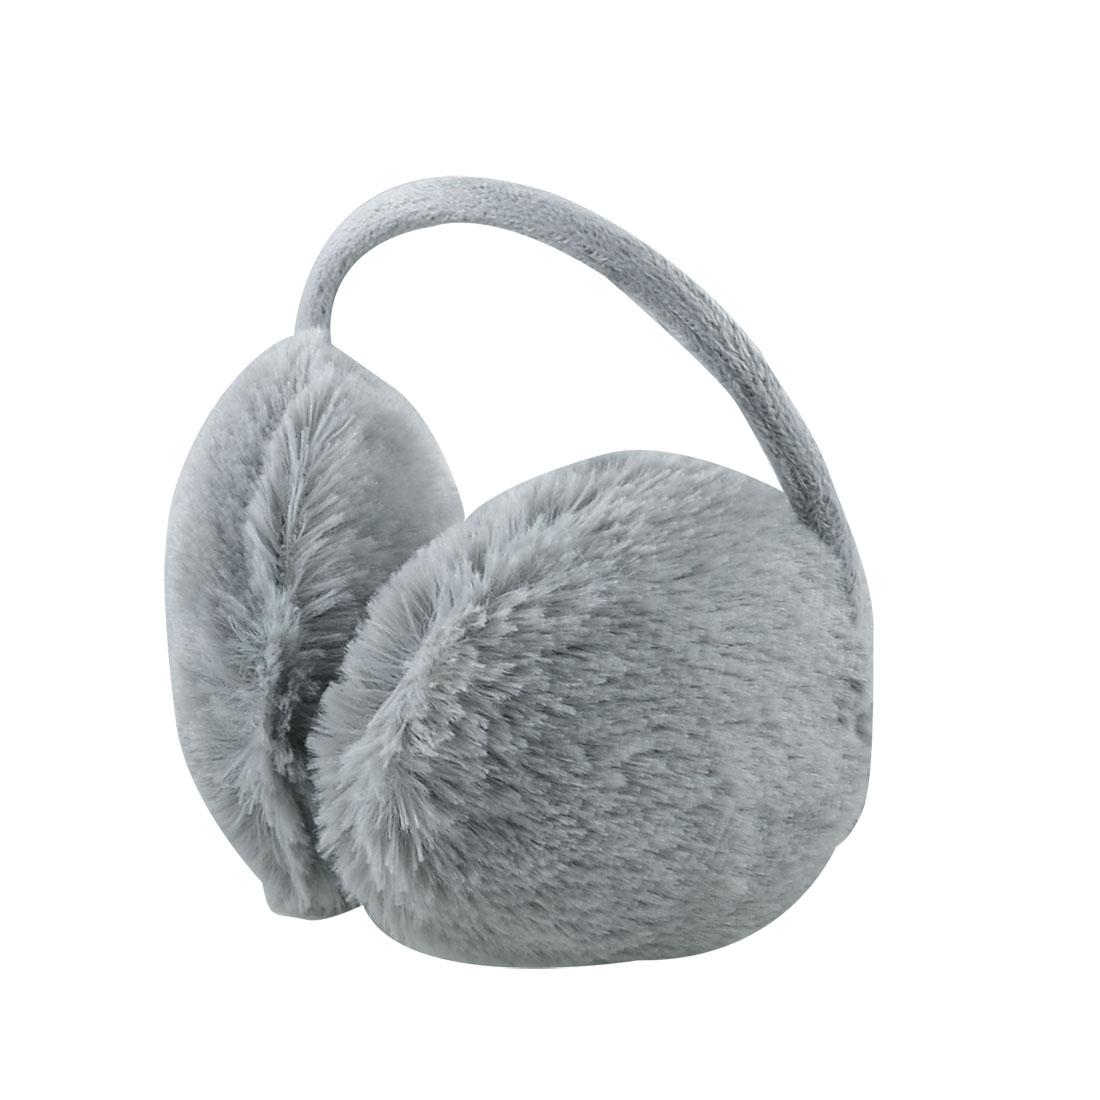 Winter Warmer Metal Bow Frame Plush Fluffy Earlap Ear Covers Back Earmuffs Gray